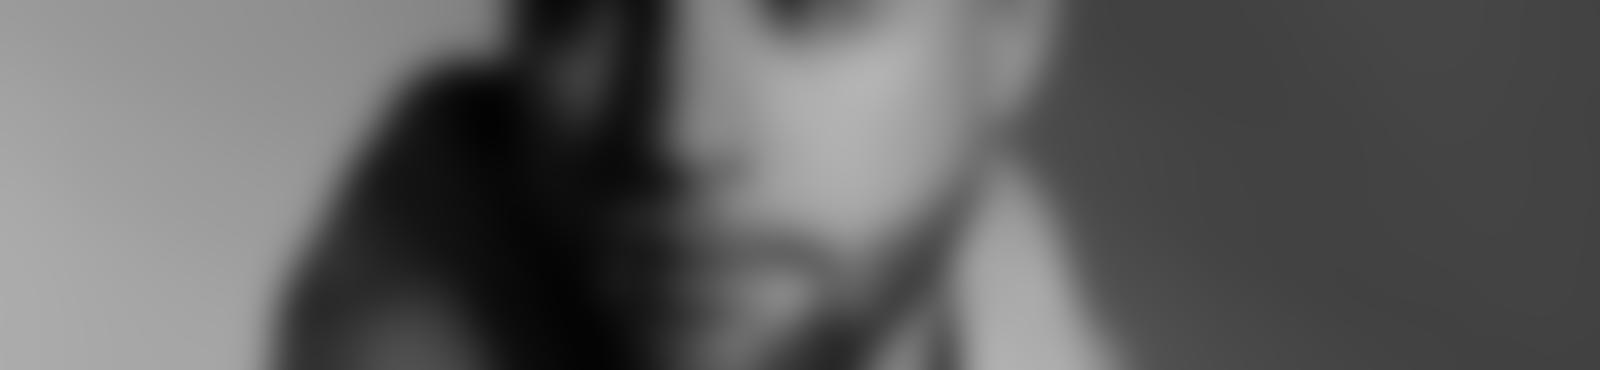 Blurred c56044f1 6cba 4a61 8fcd 44bf9bfbf75b